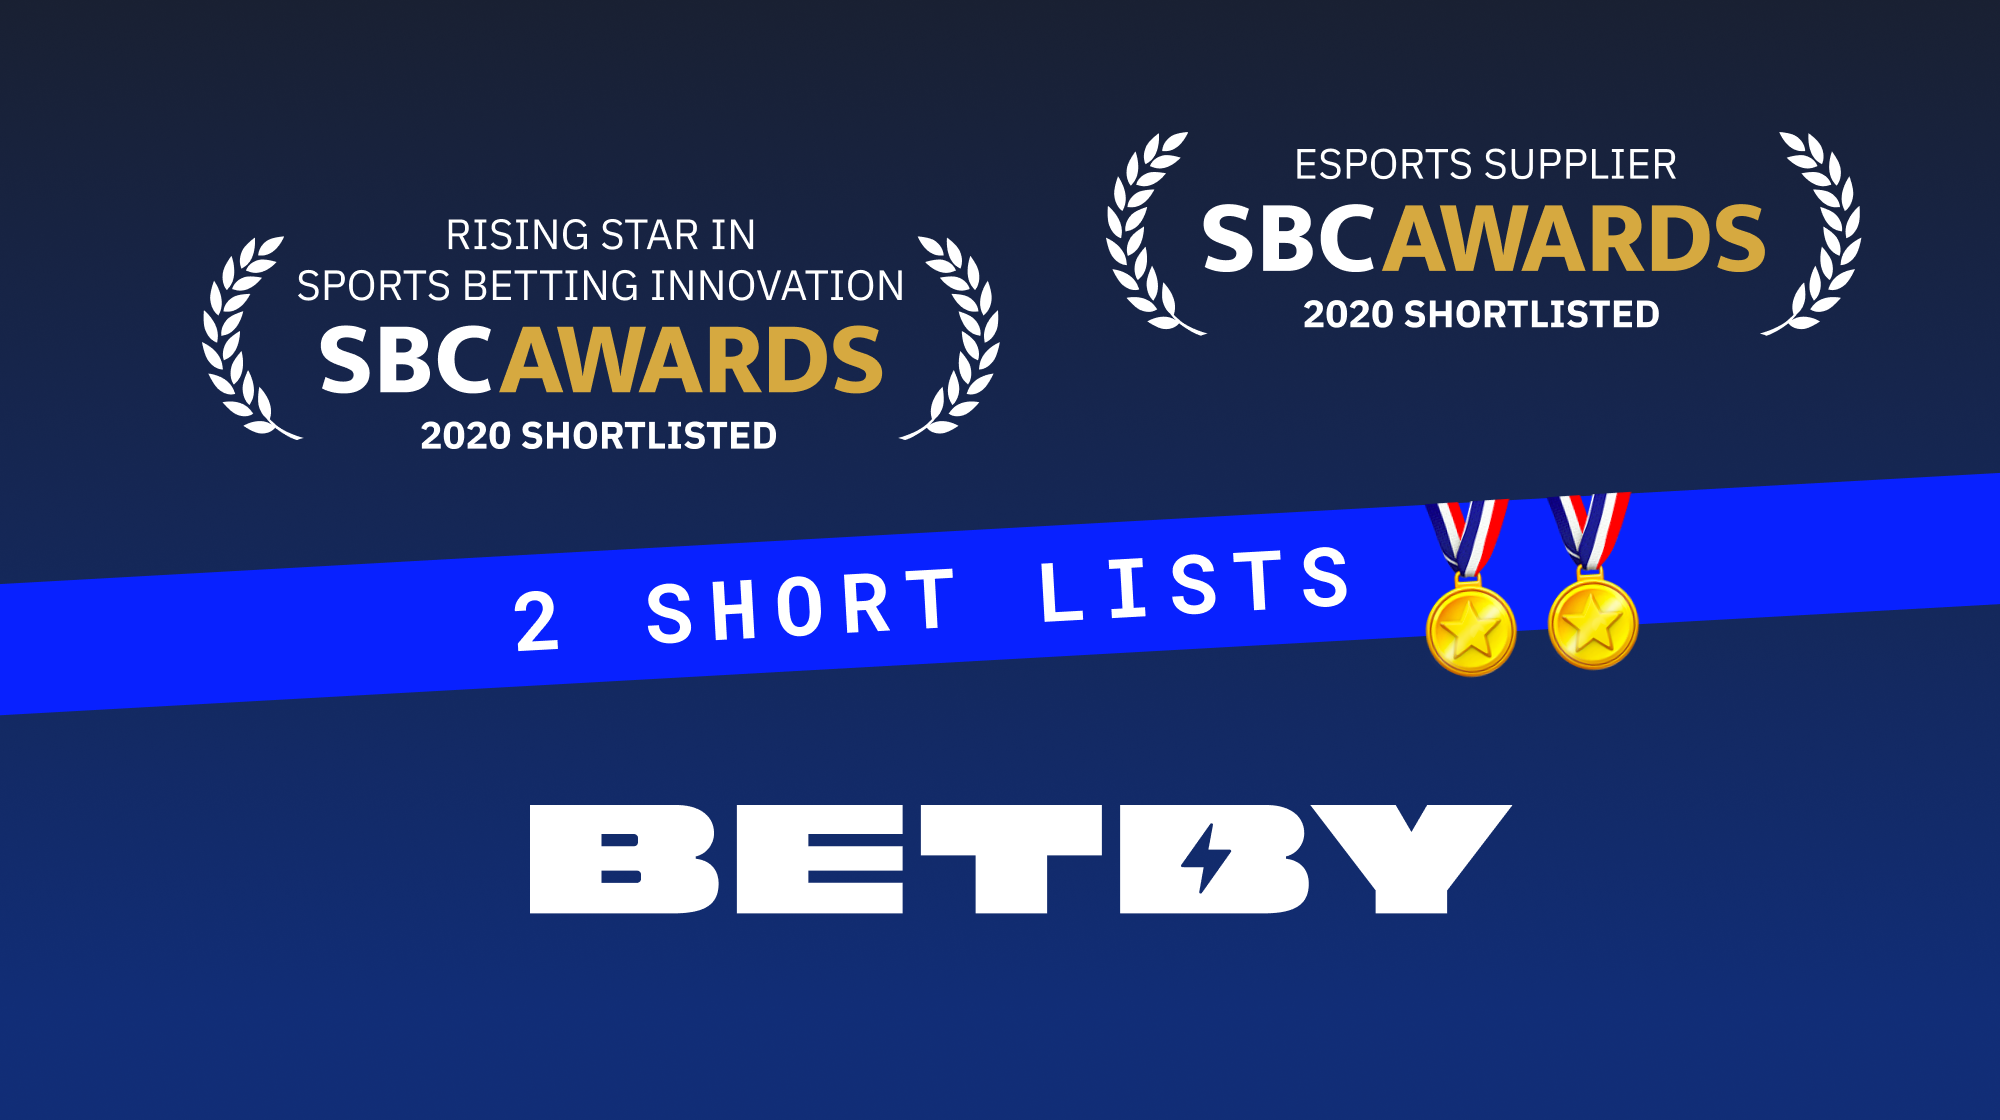 BETBY celebrates double nomination at SBC Awards